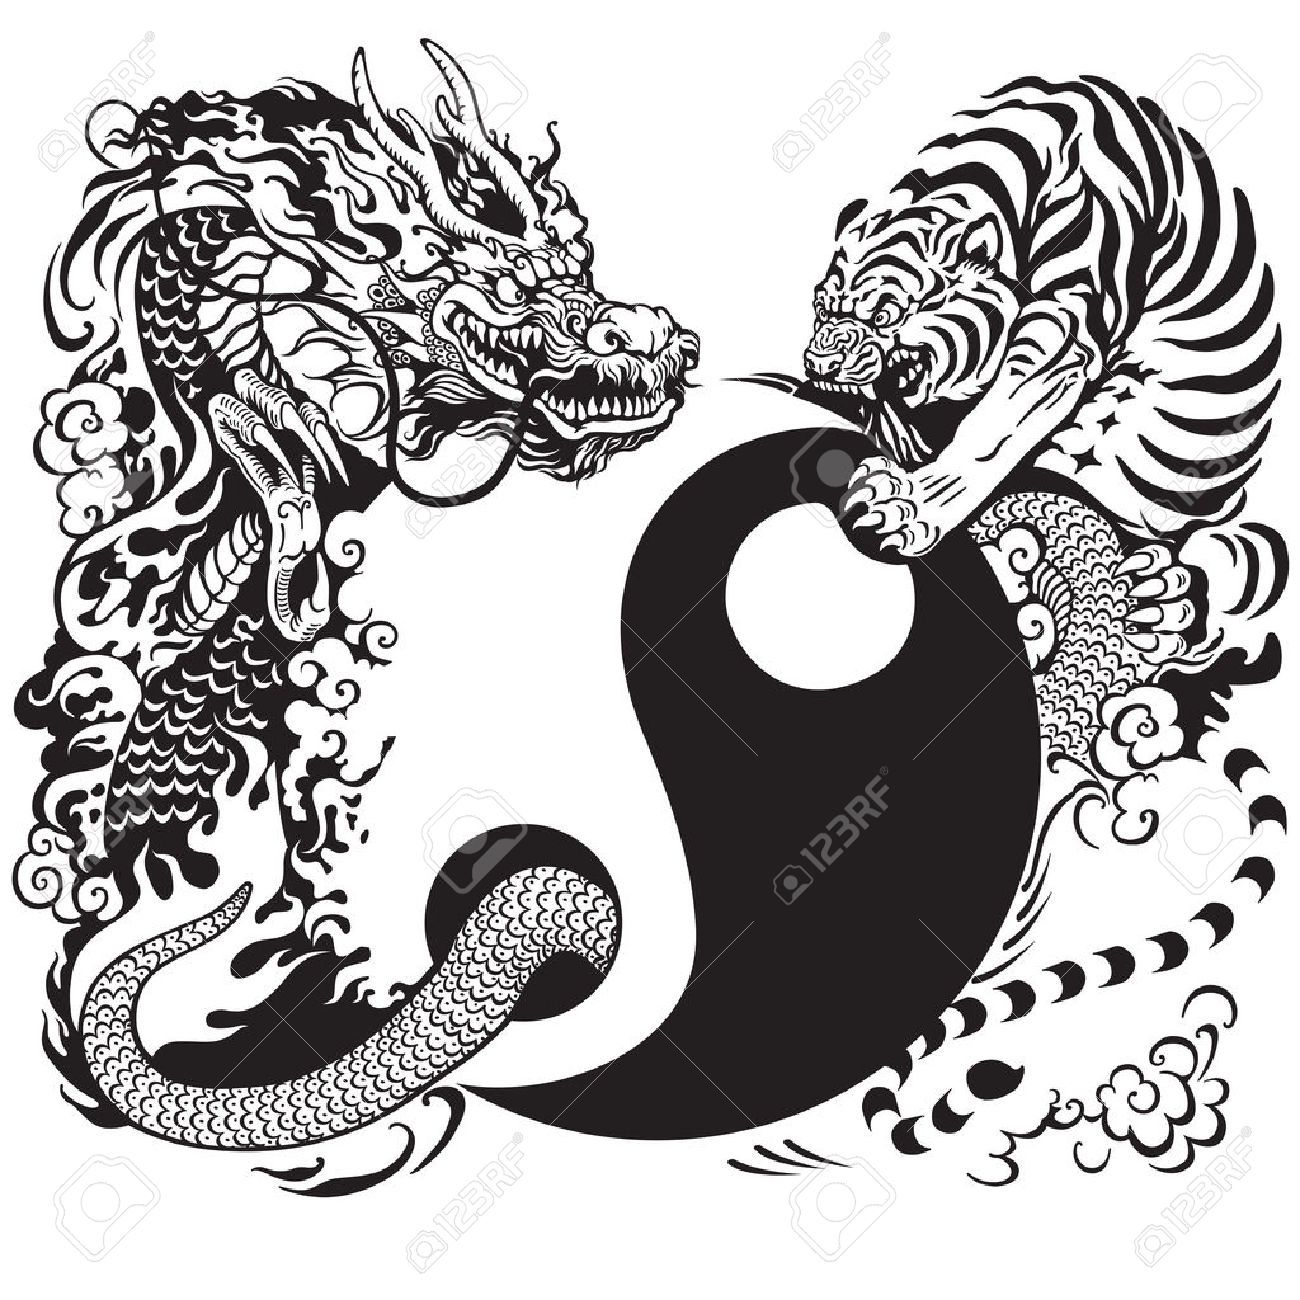 Afbeeldingsresultaat voor yin yang tattoo patronen patronen tattoo ying yang pinterest yin - Dessin dragon japonais ...